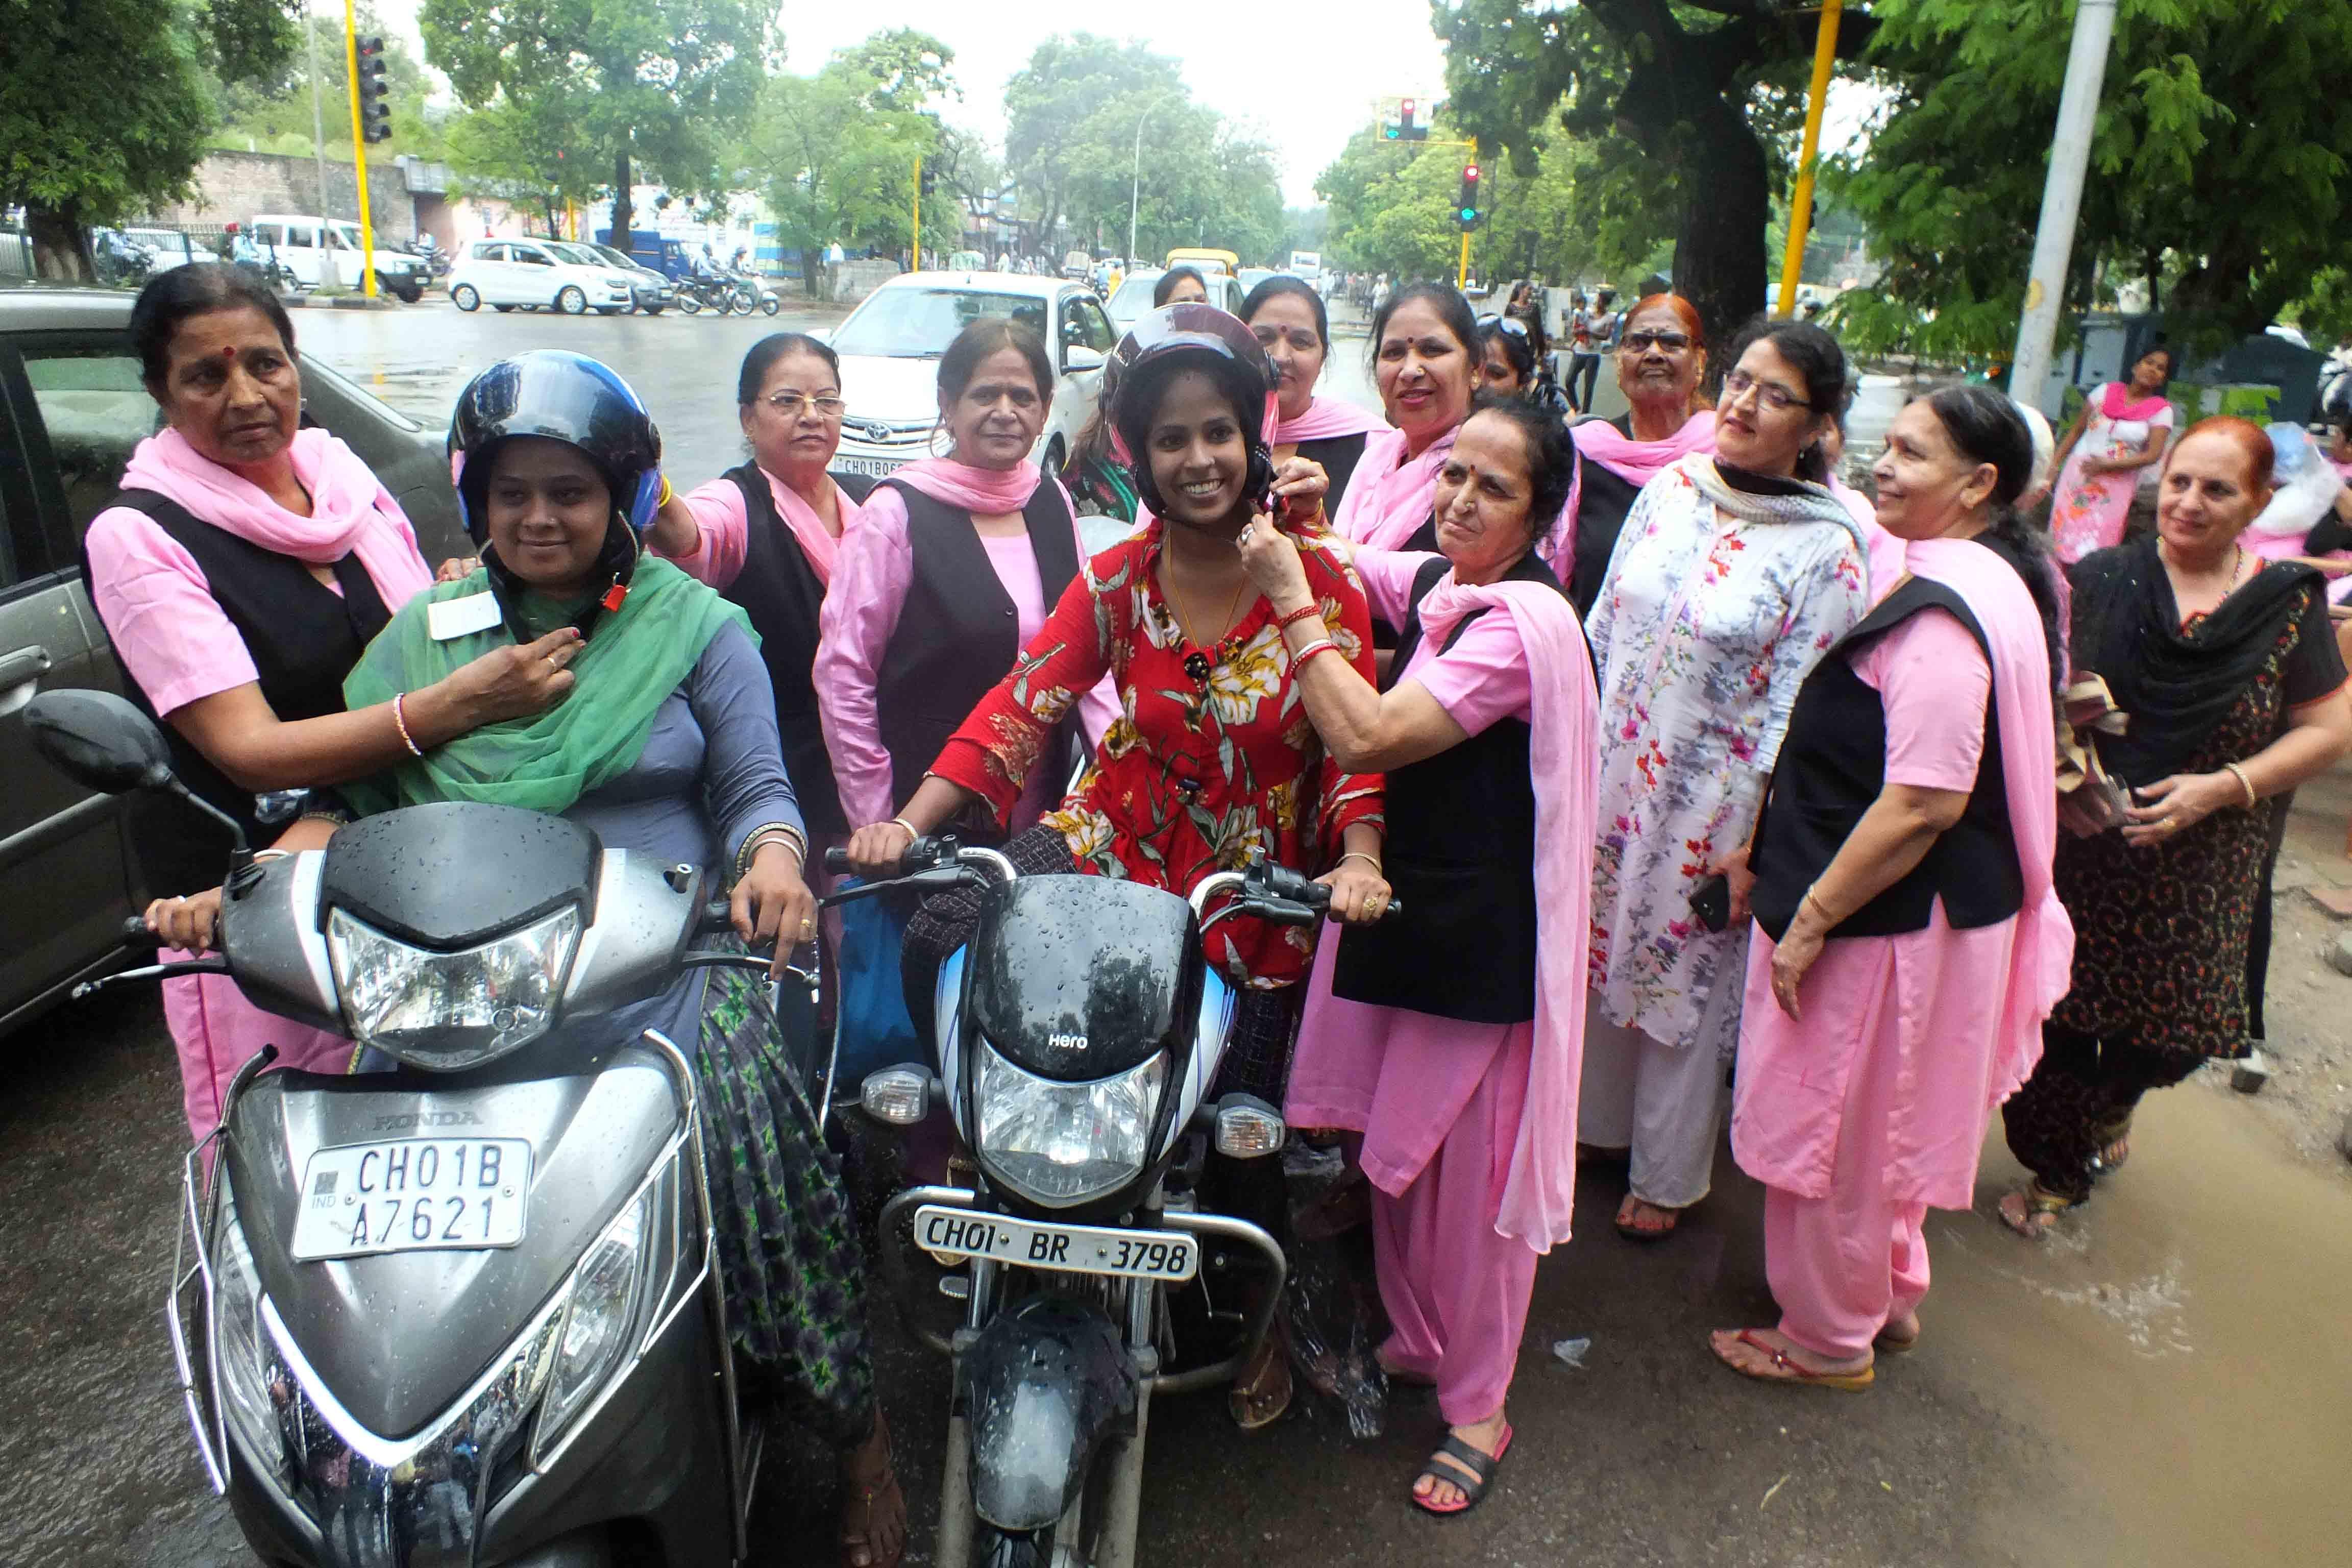 Helmets for Women Safety